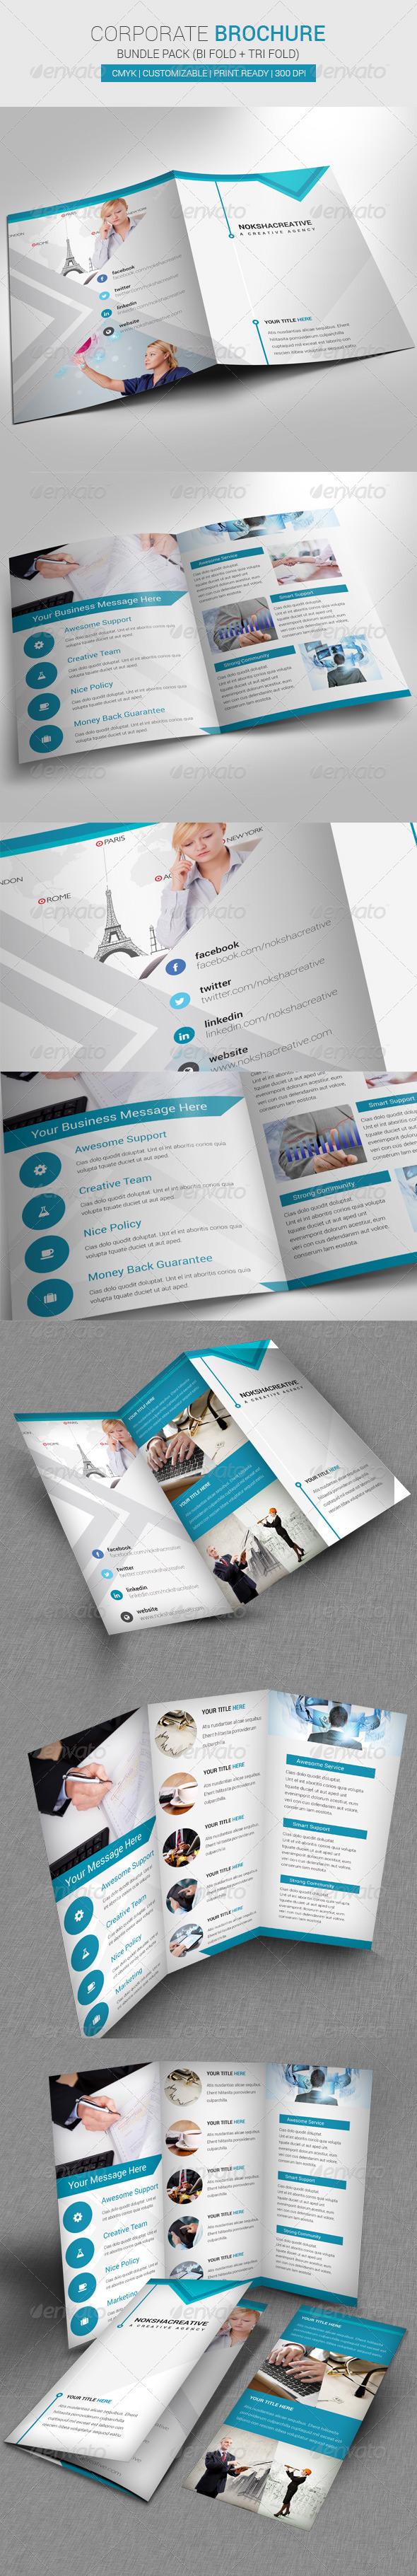 Bundle Pack Brochure - Corporate Brochures